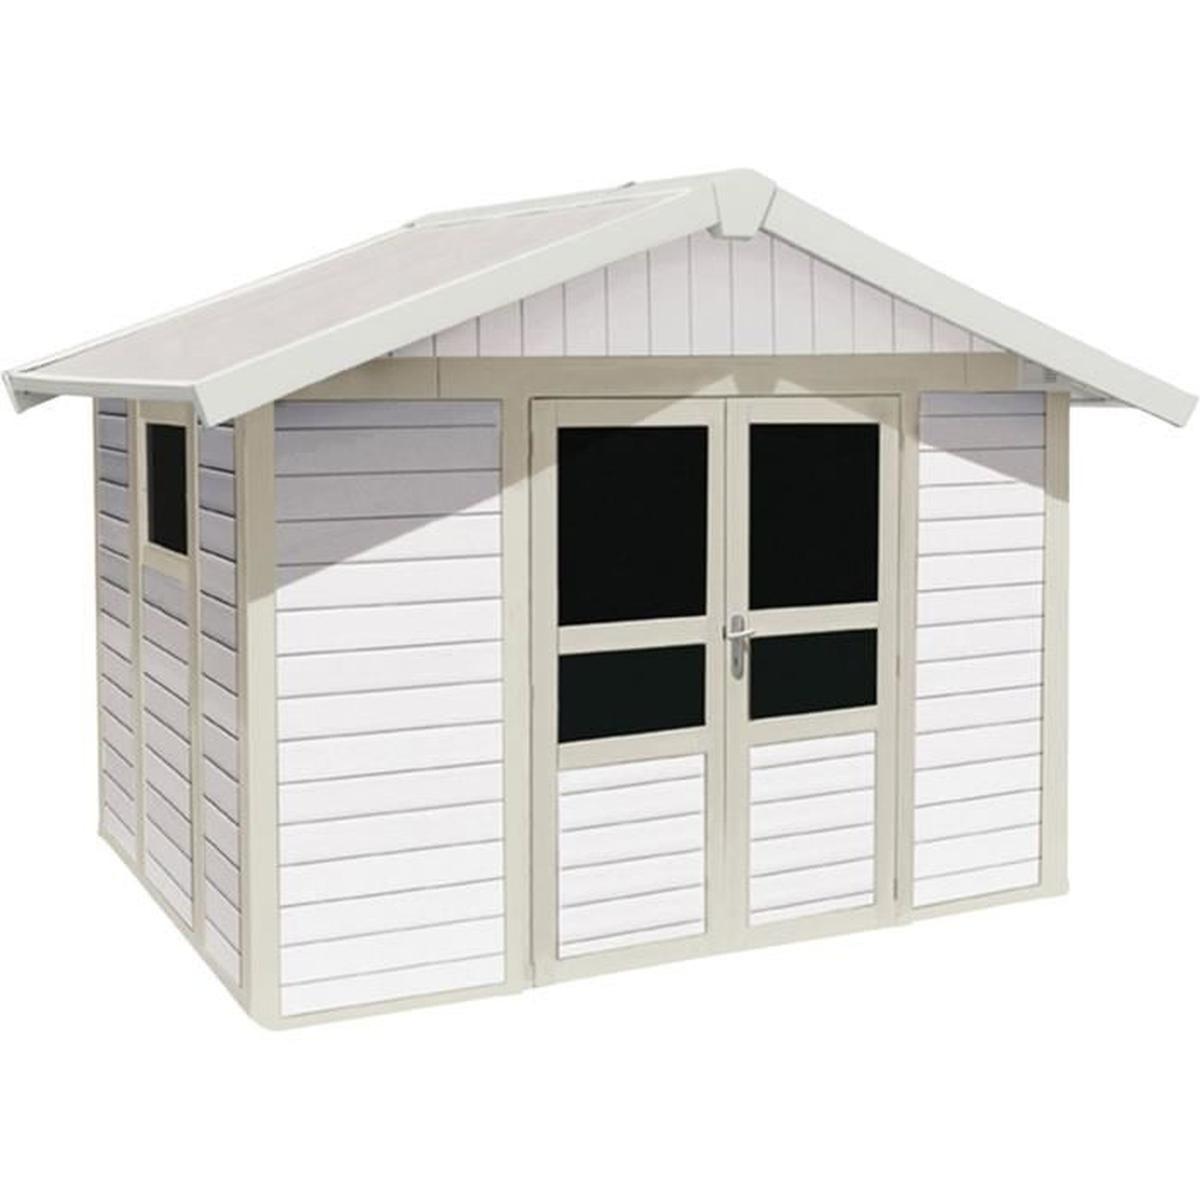 Basic Home Abri De Jardin Grosfillex Blanc En Pvc 11M² ... intérieur Grosfillex Abri De Jardin Pvc